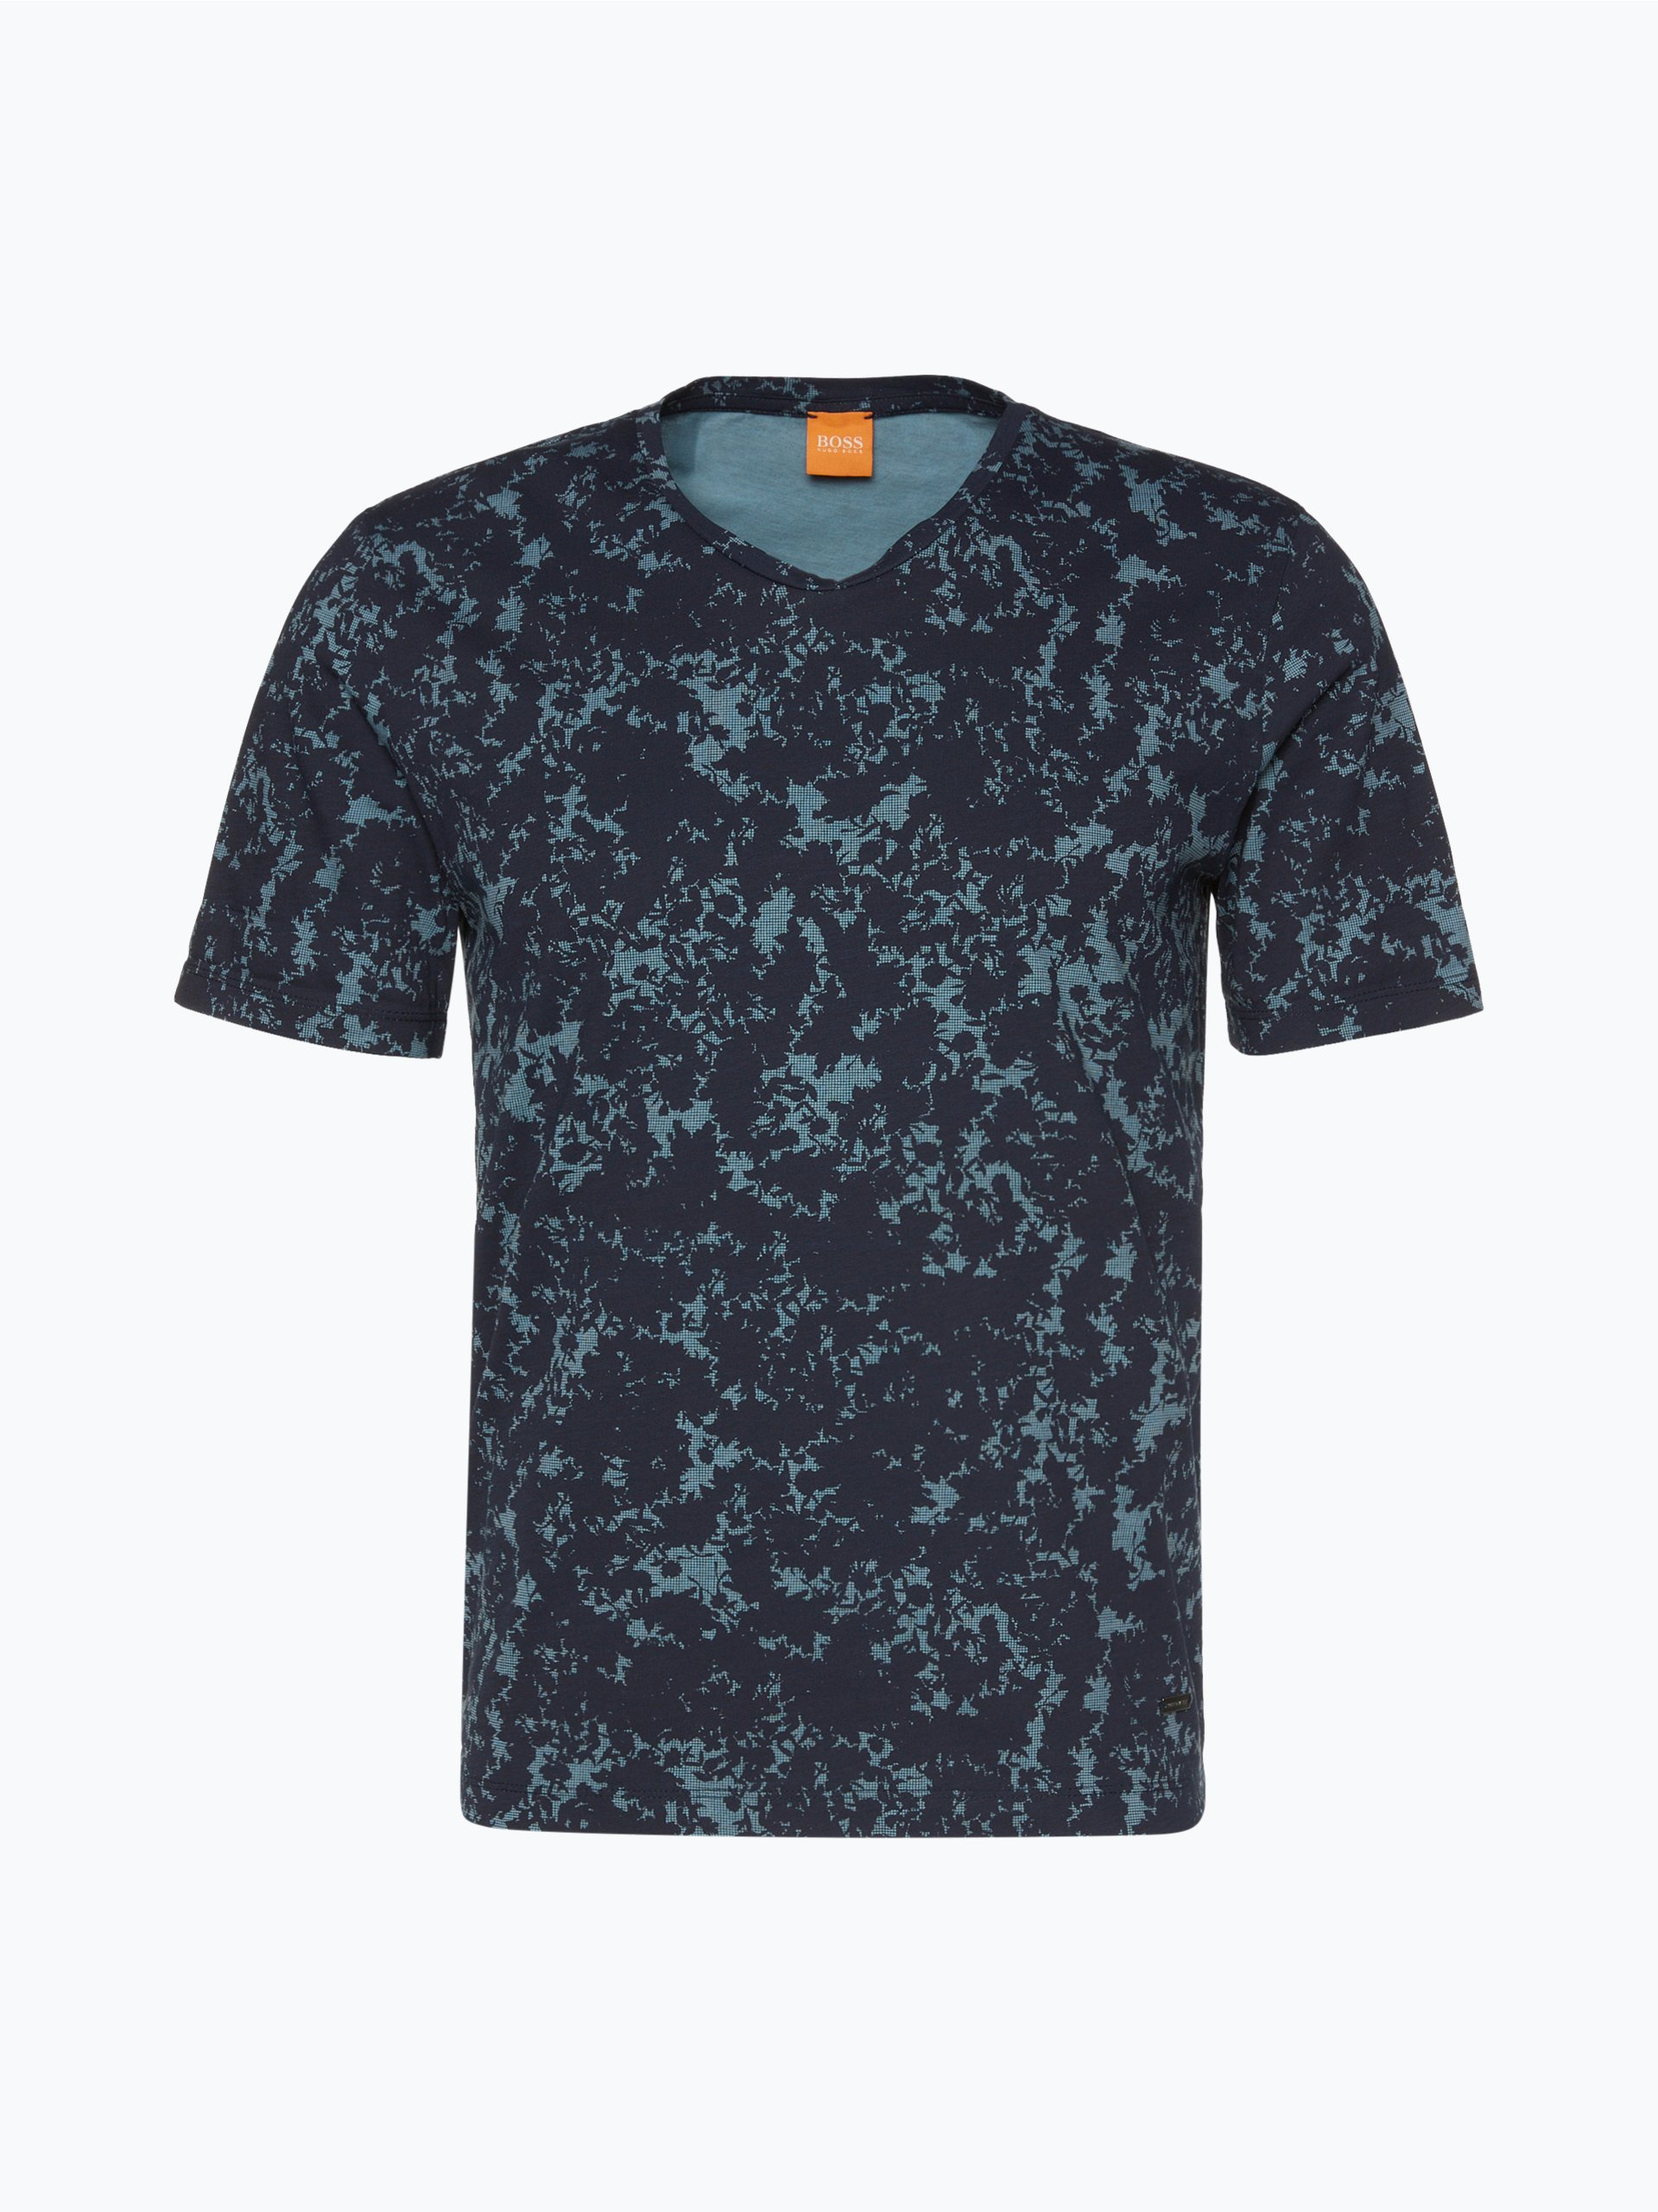 boss orange herren t shirt topmost marine gemustert. Black Bedroom Furniture Sets. Home Design Ideas